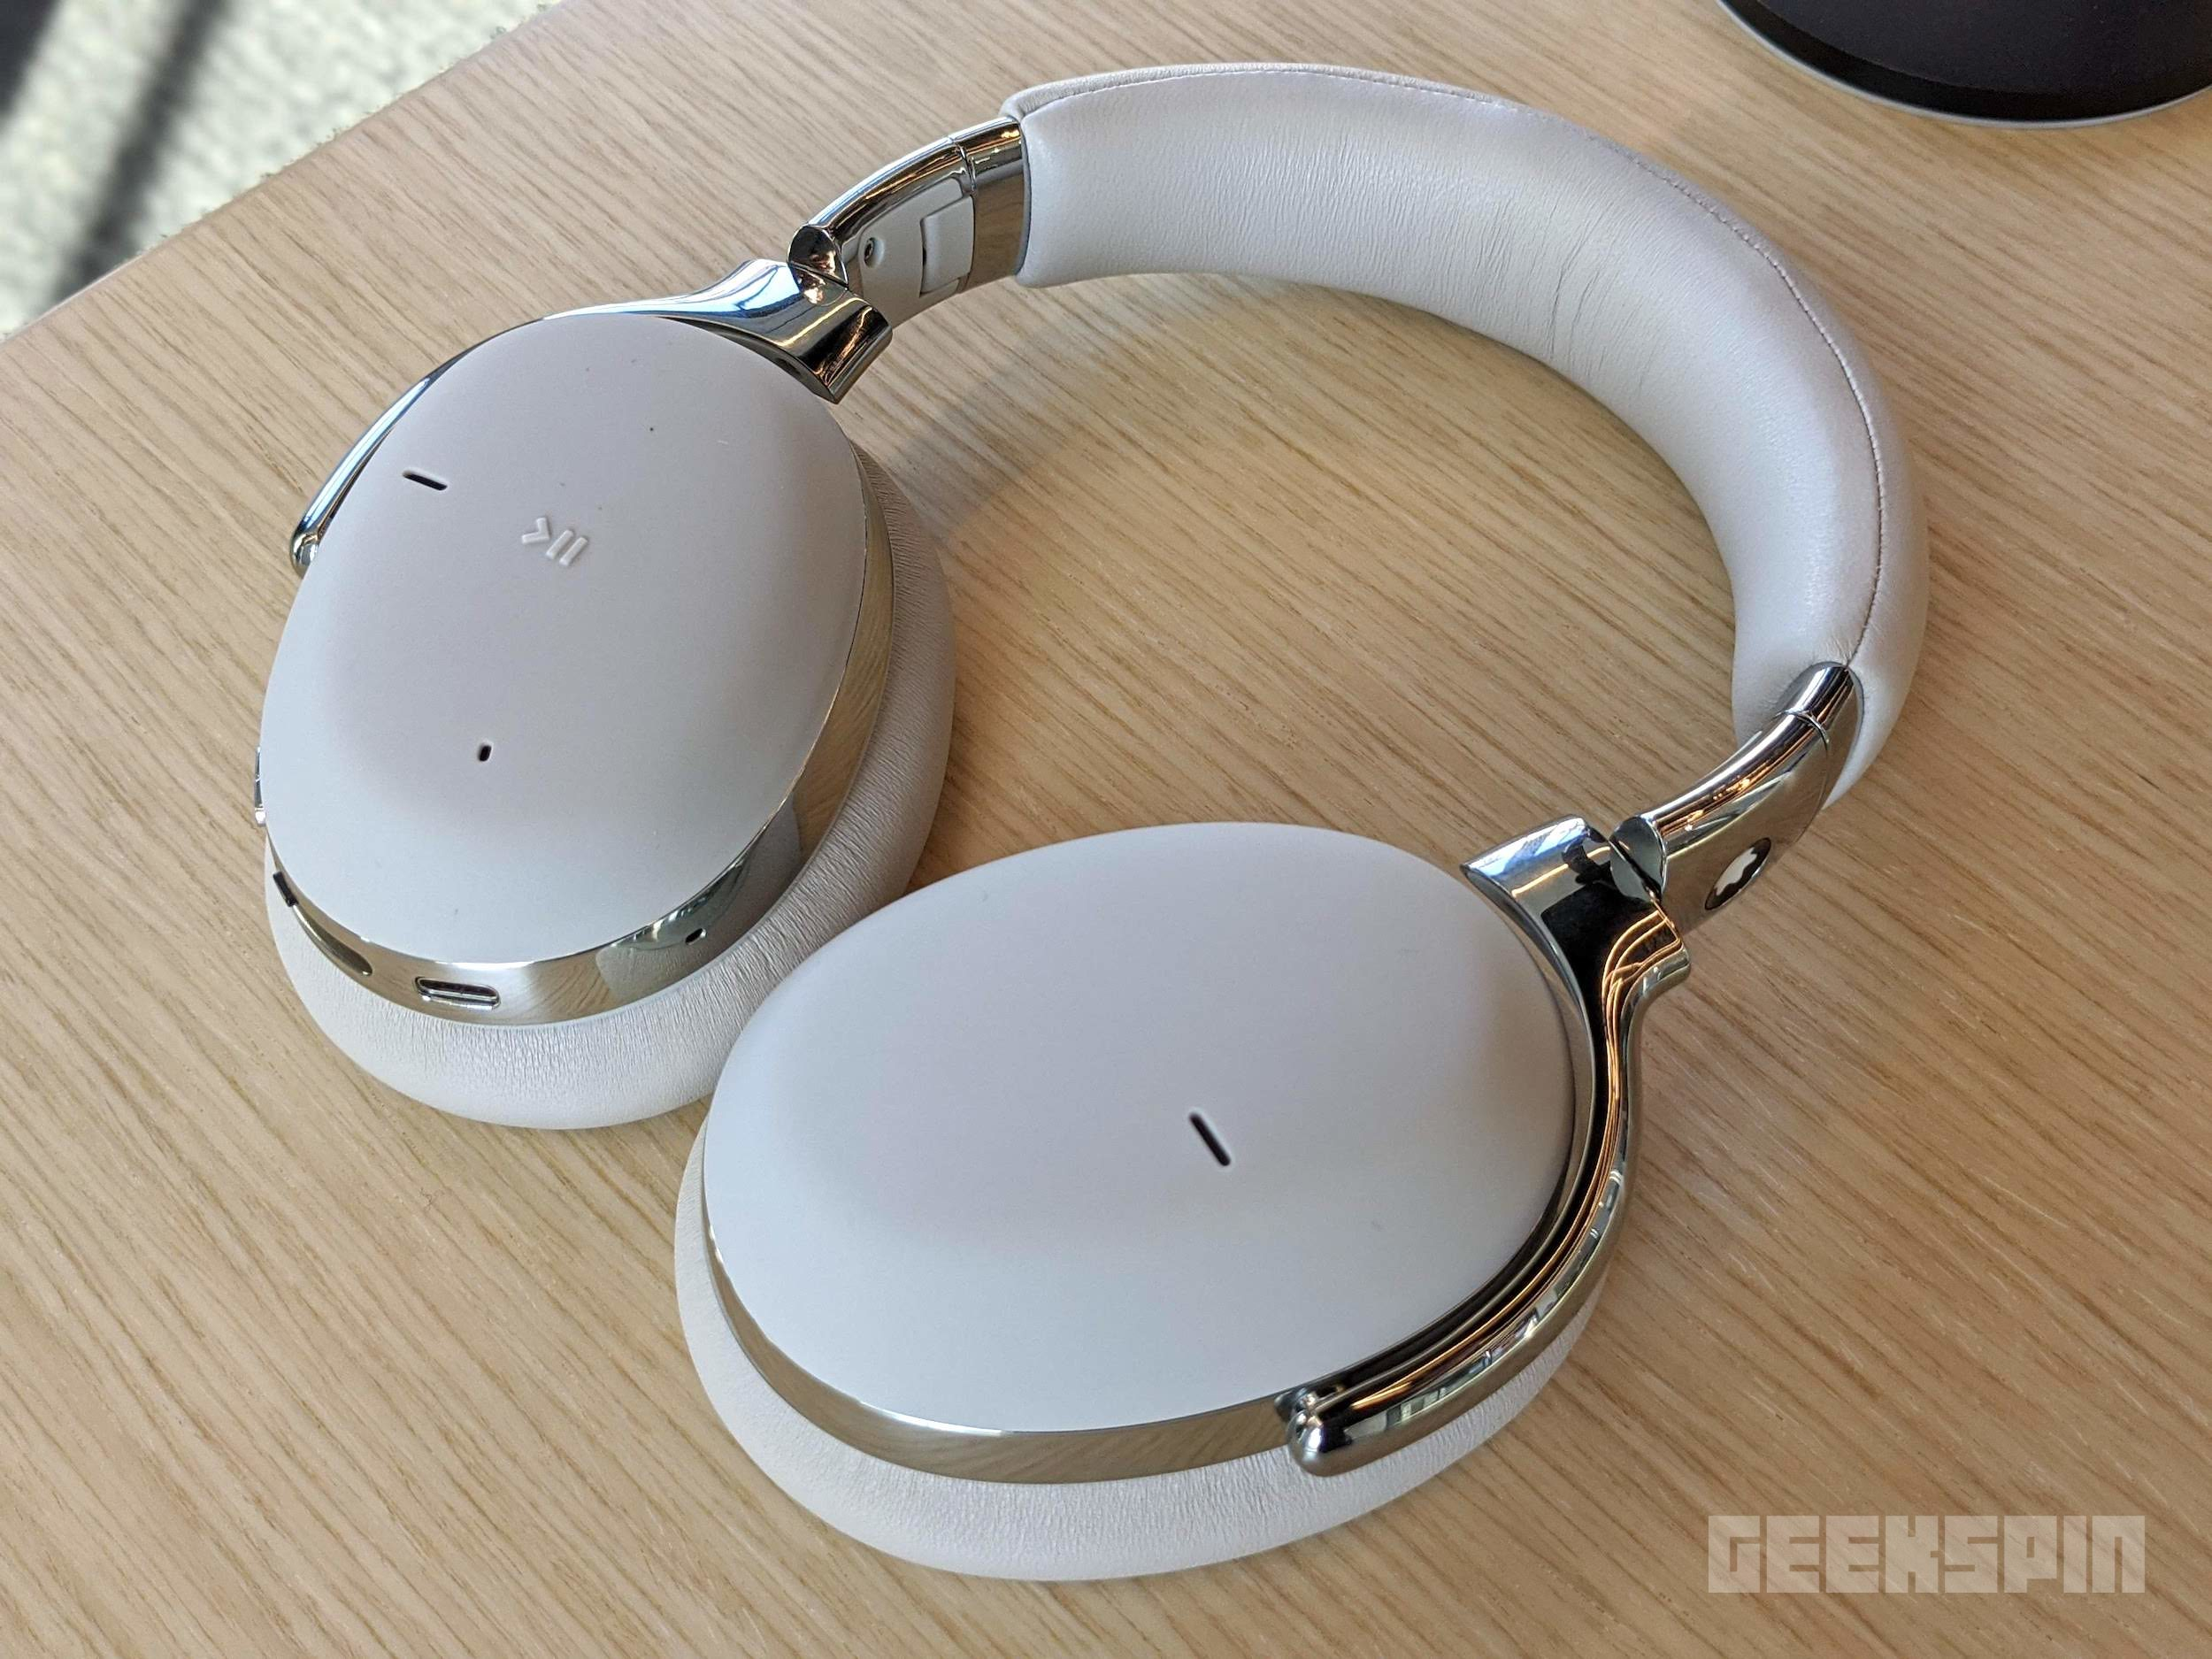 MontblancWireless Over-Ear Headphones